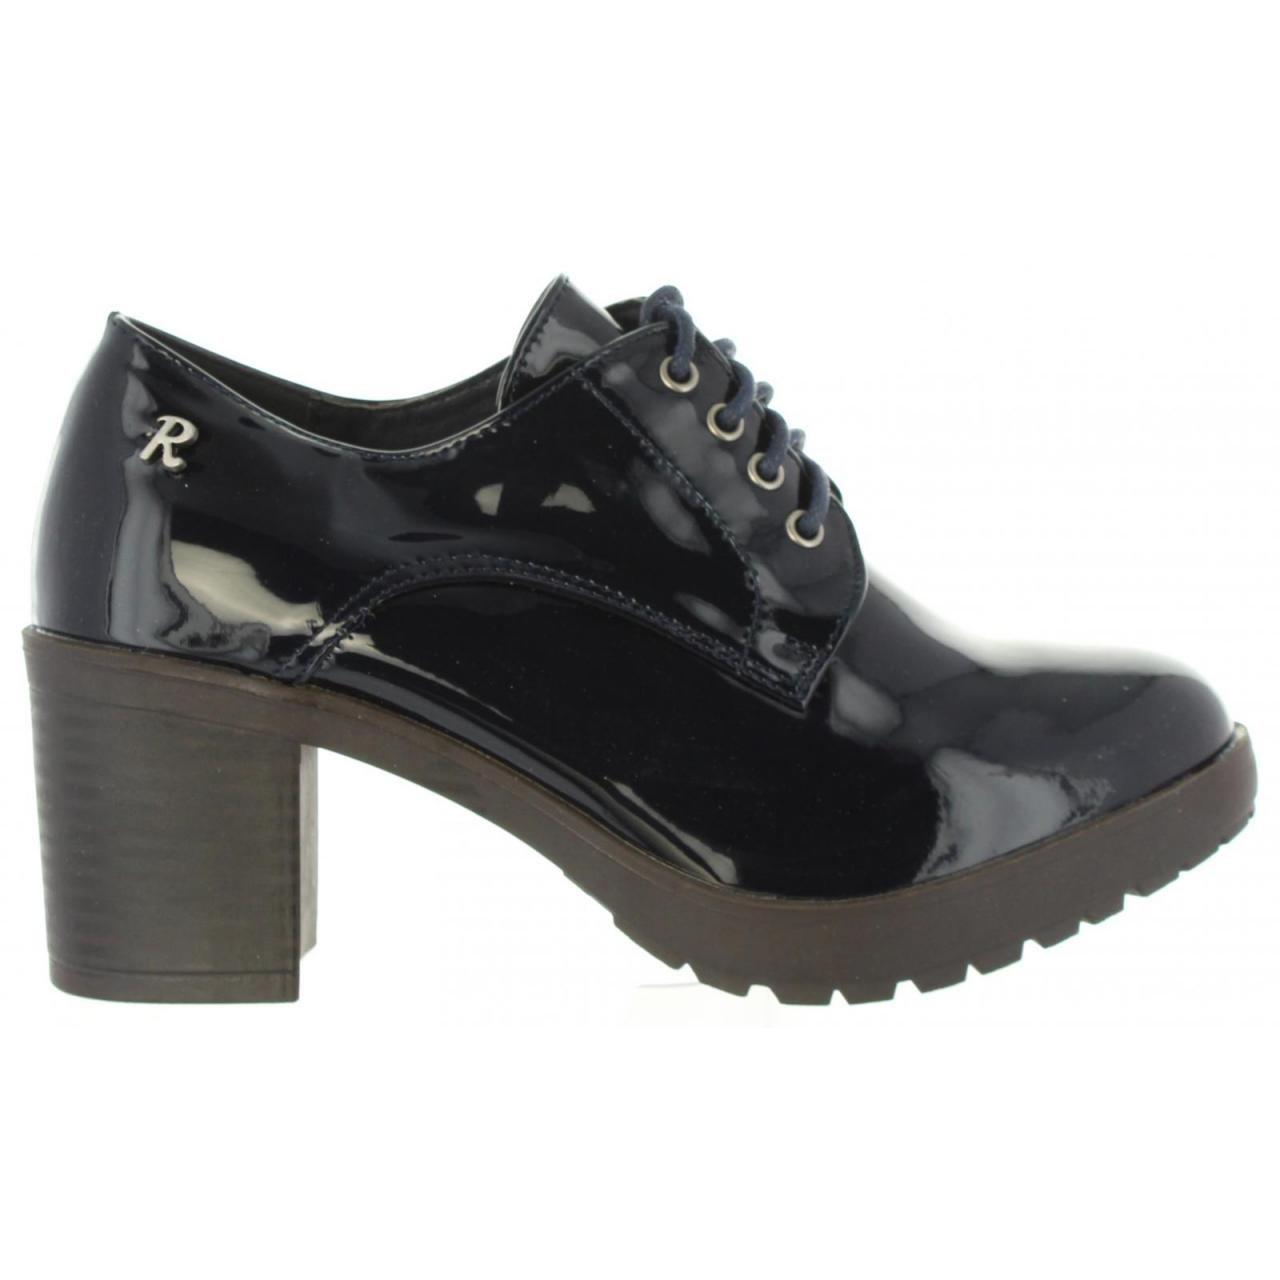 TALLA 39 EU. Zapatos de tacón de Mujer REFRESH 63661 Charol Navy